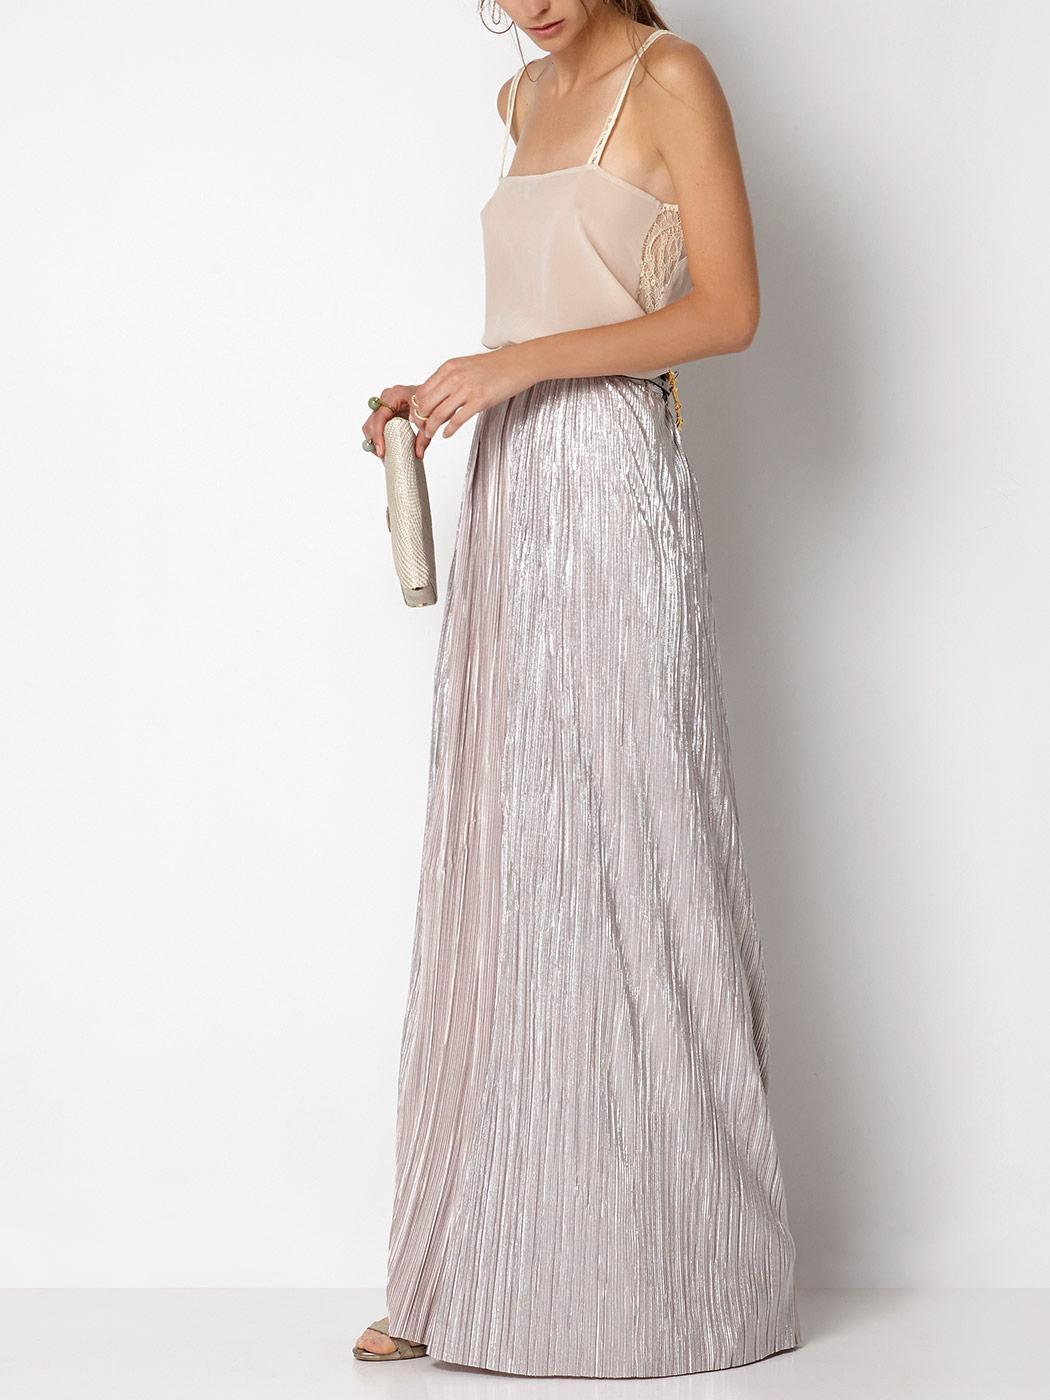 110€ introp falda